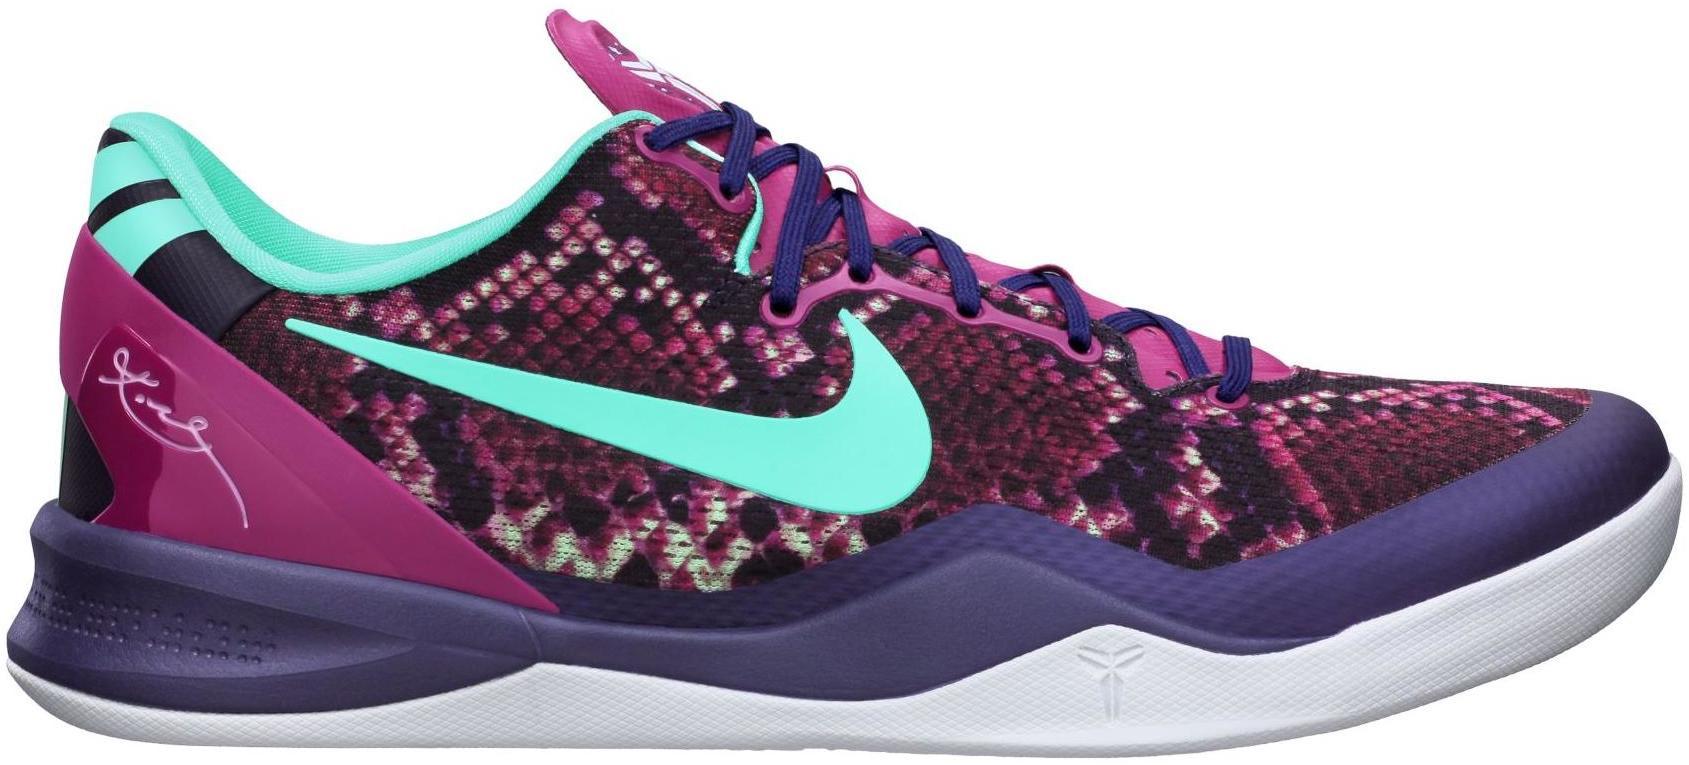 Buy Nike Kobe 8 Shoes & Deadstock Sneakers